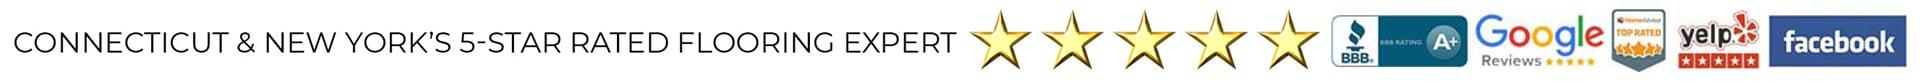 All Hardwood Floors is Connecticut & New York's 5-star rated flooring expert!